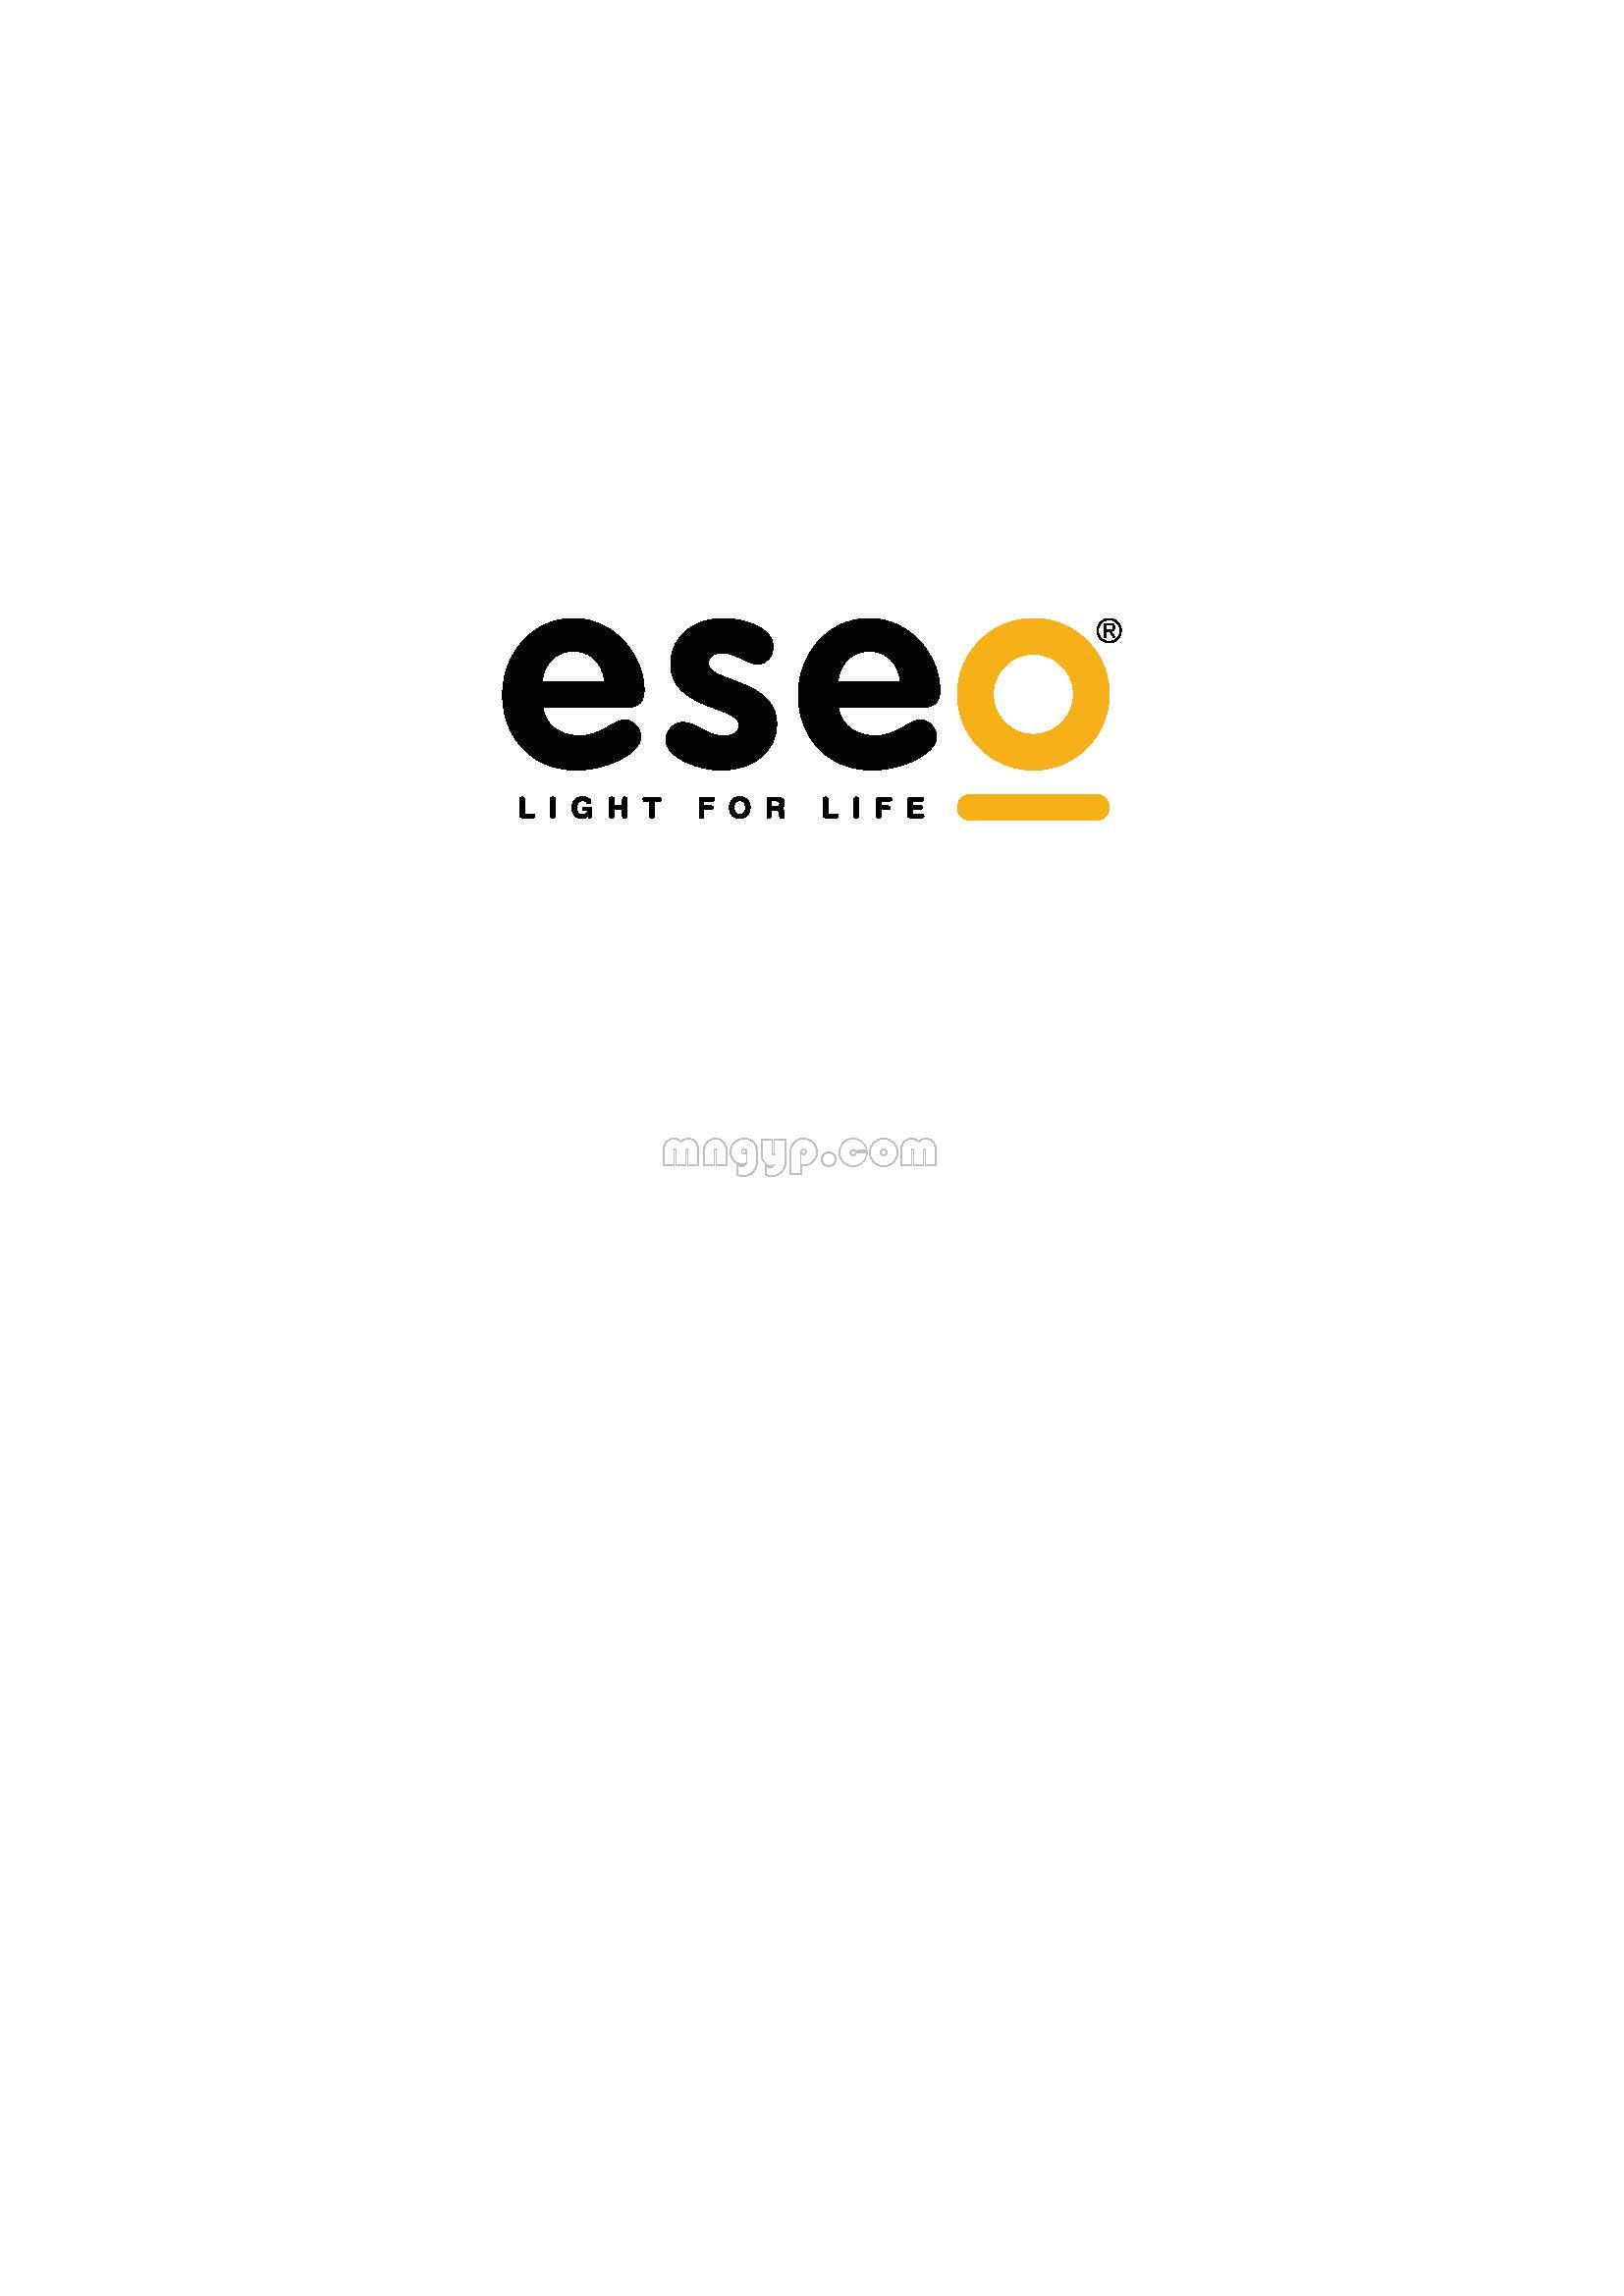 logo logo 标志 设计 图标 1654_2339 竖版 竖屏图片